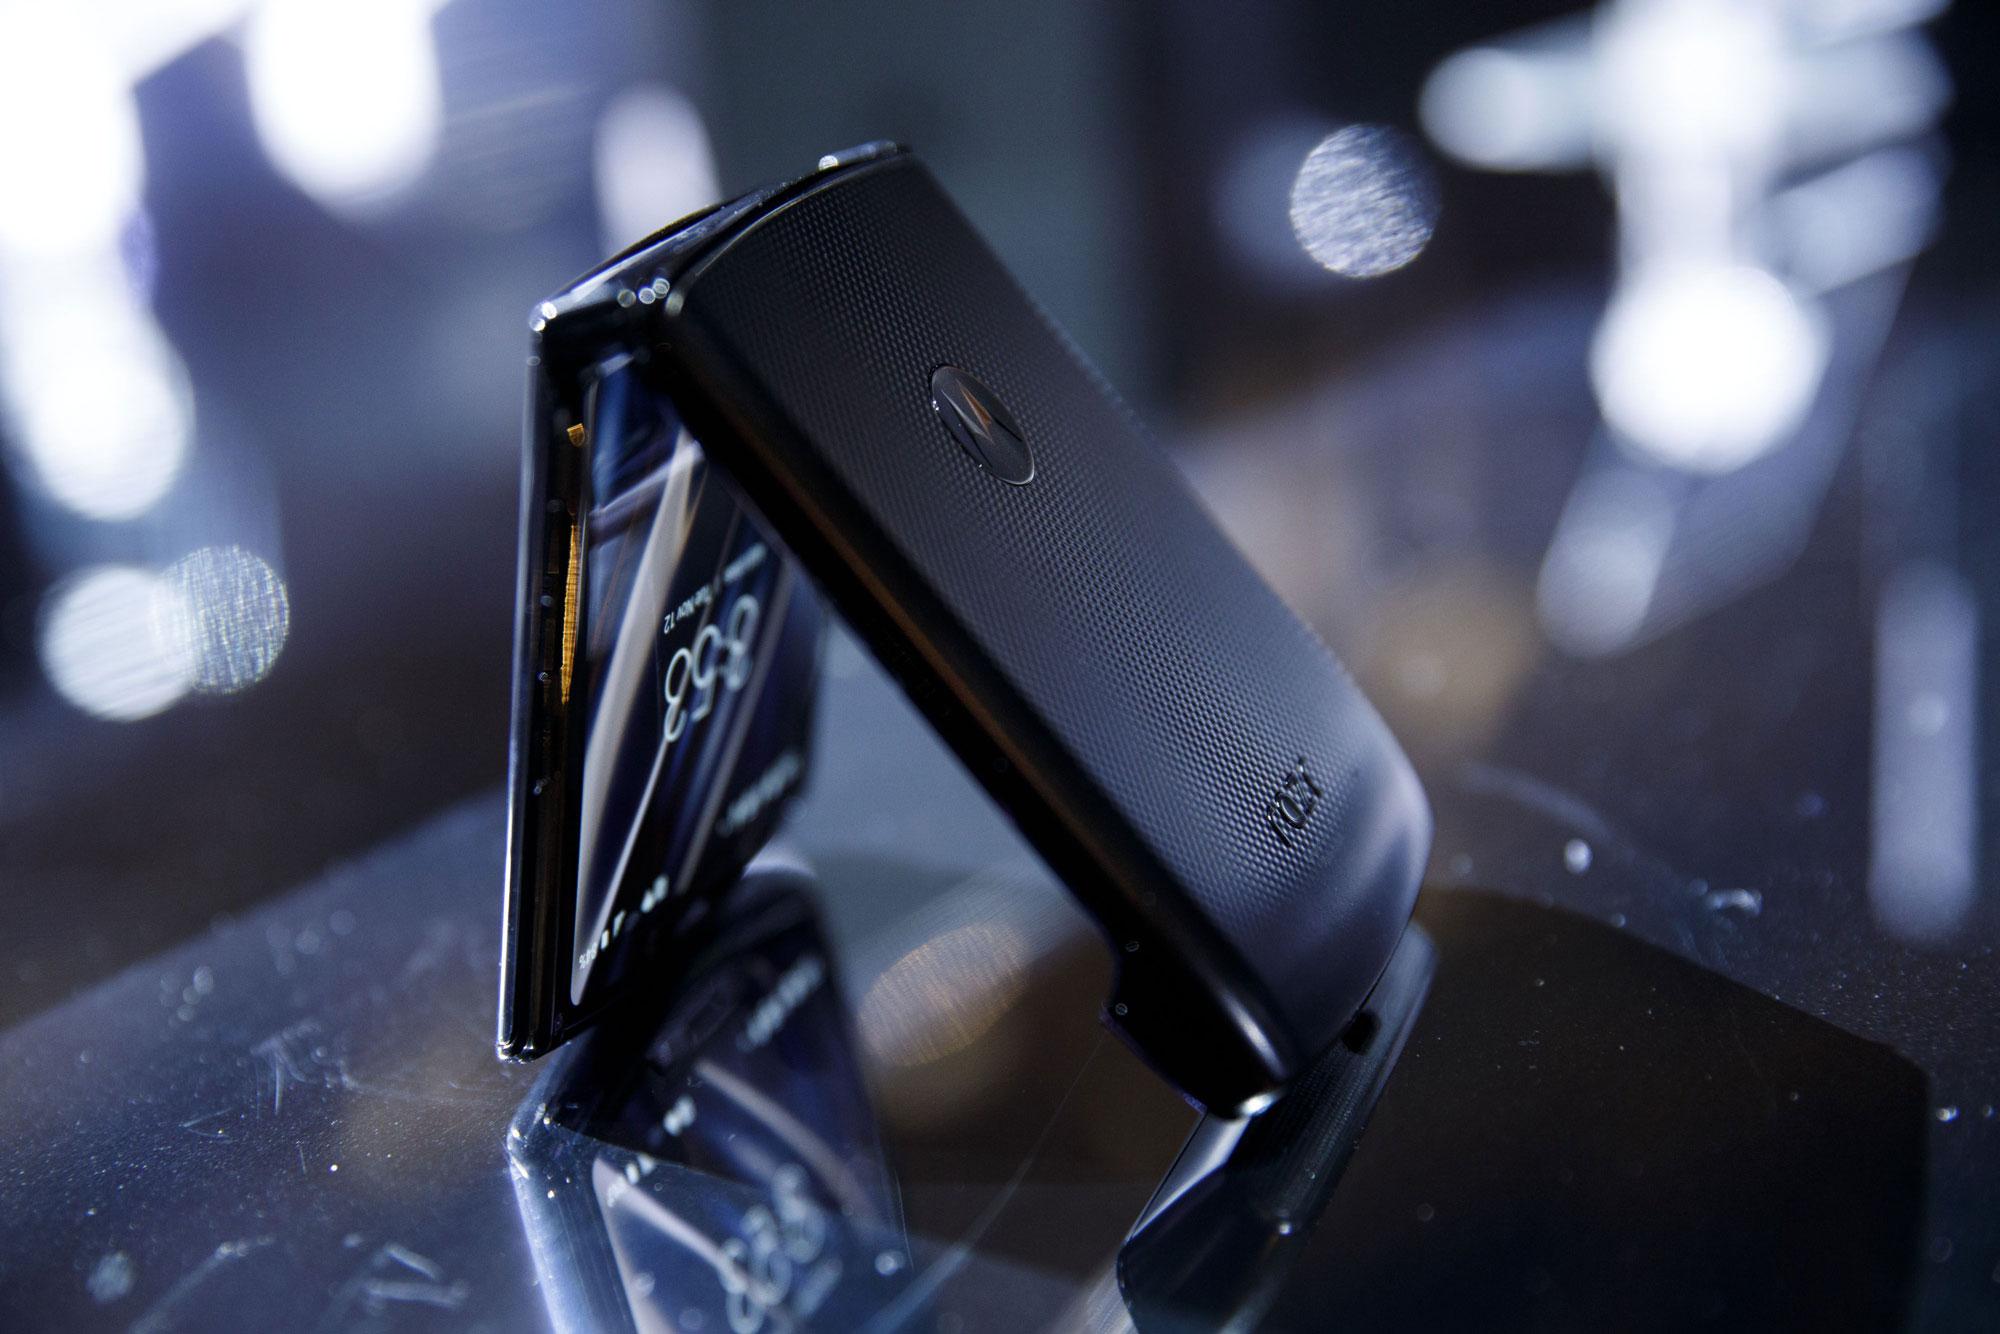 Motorola brings back the Razr as a $1,499 foldable smartphone